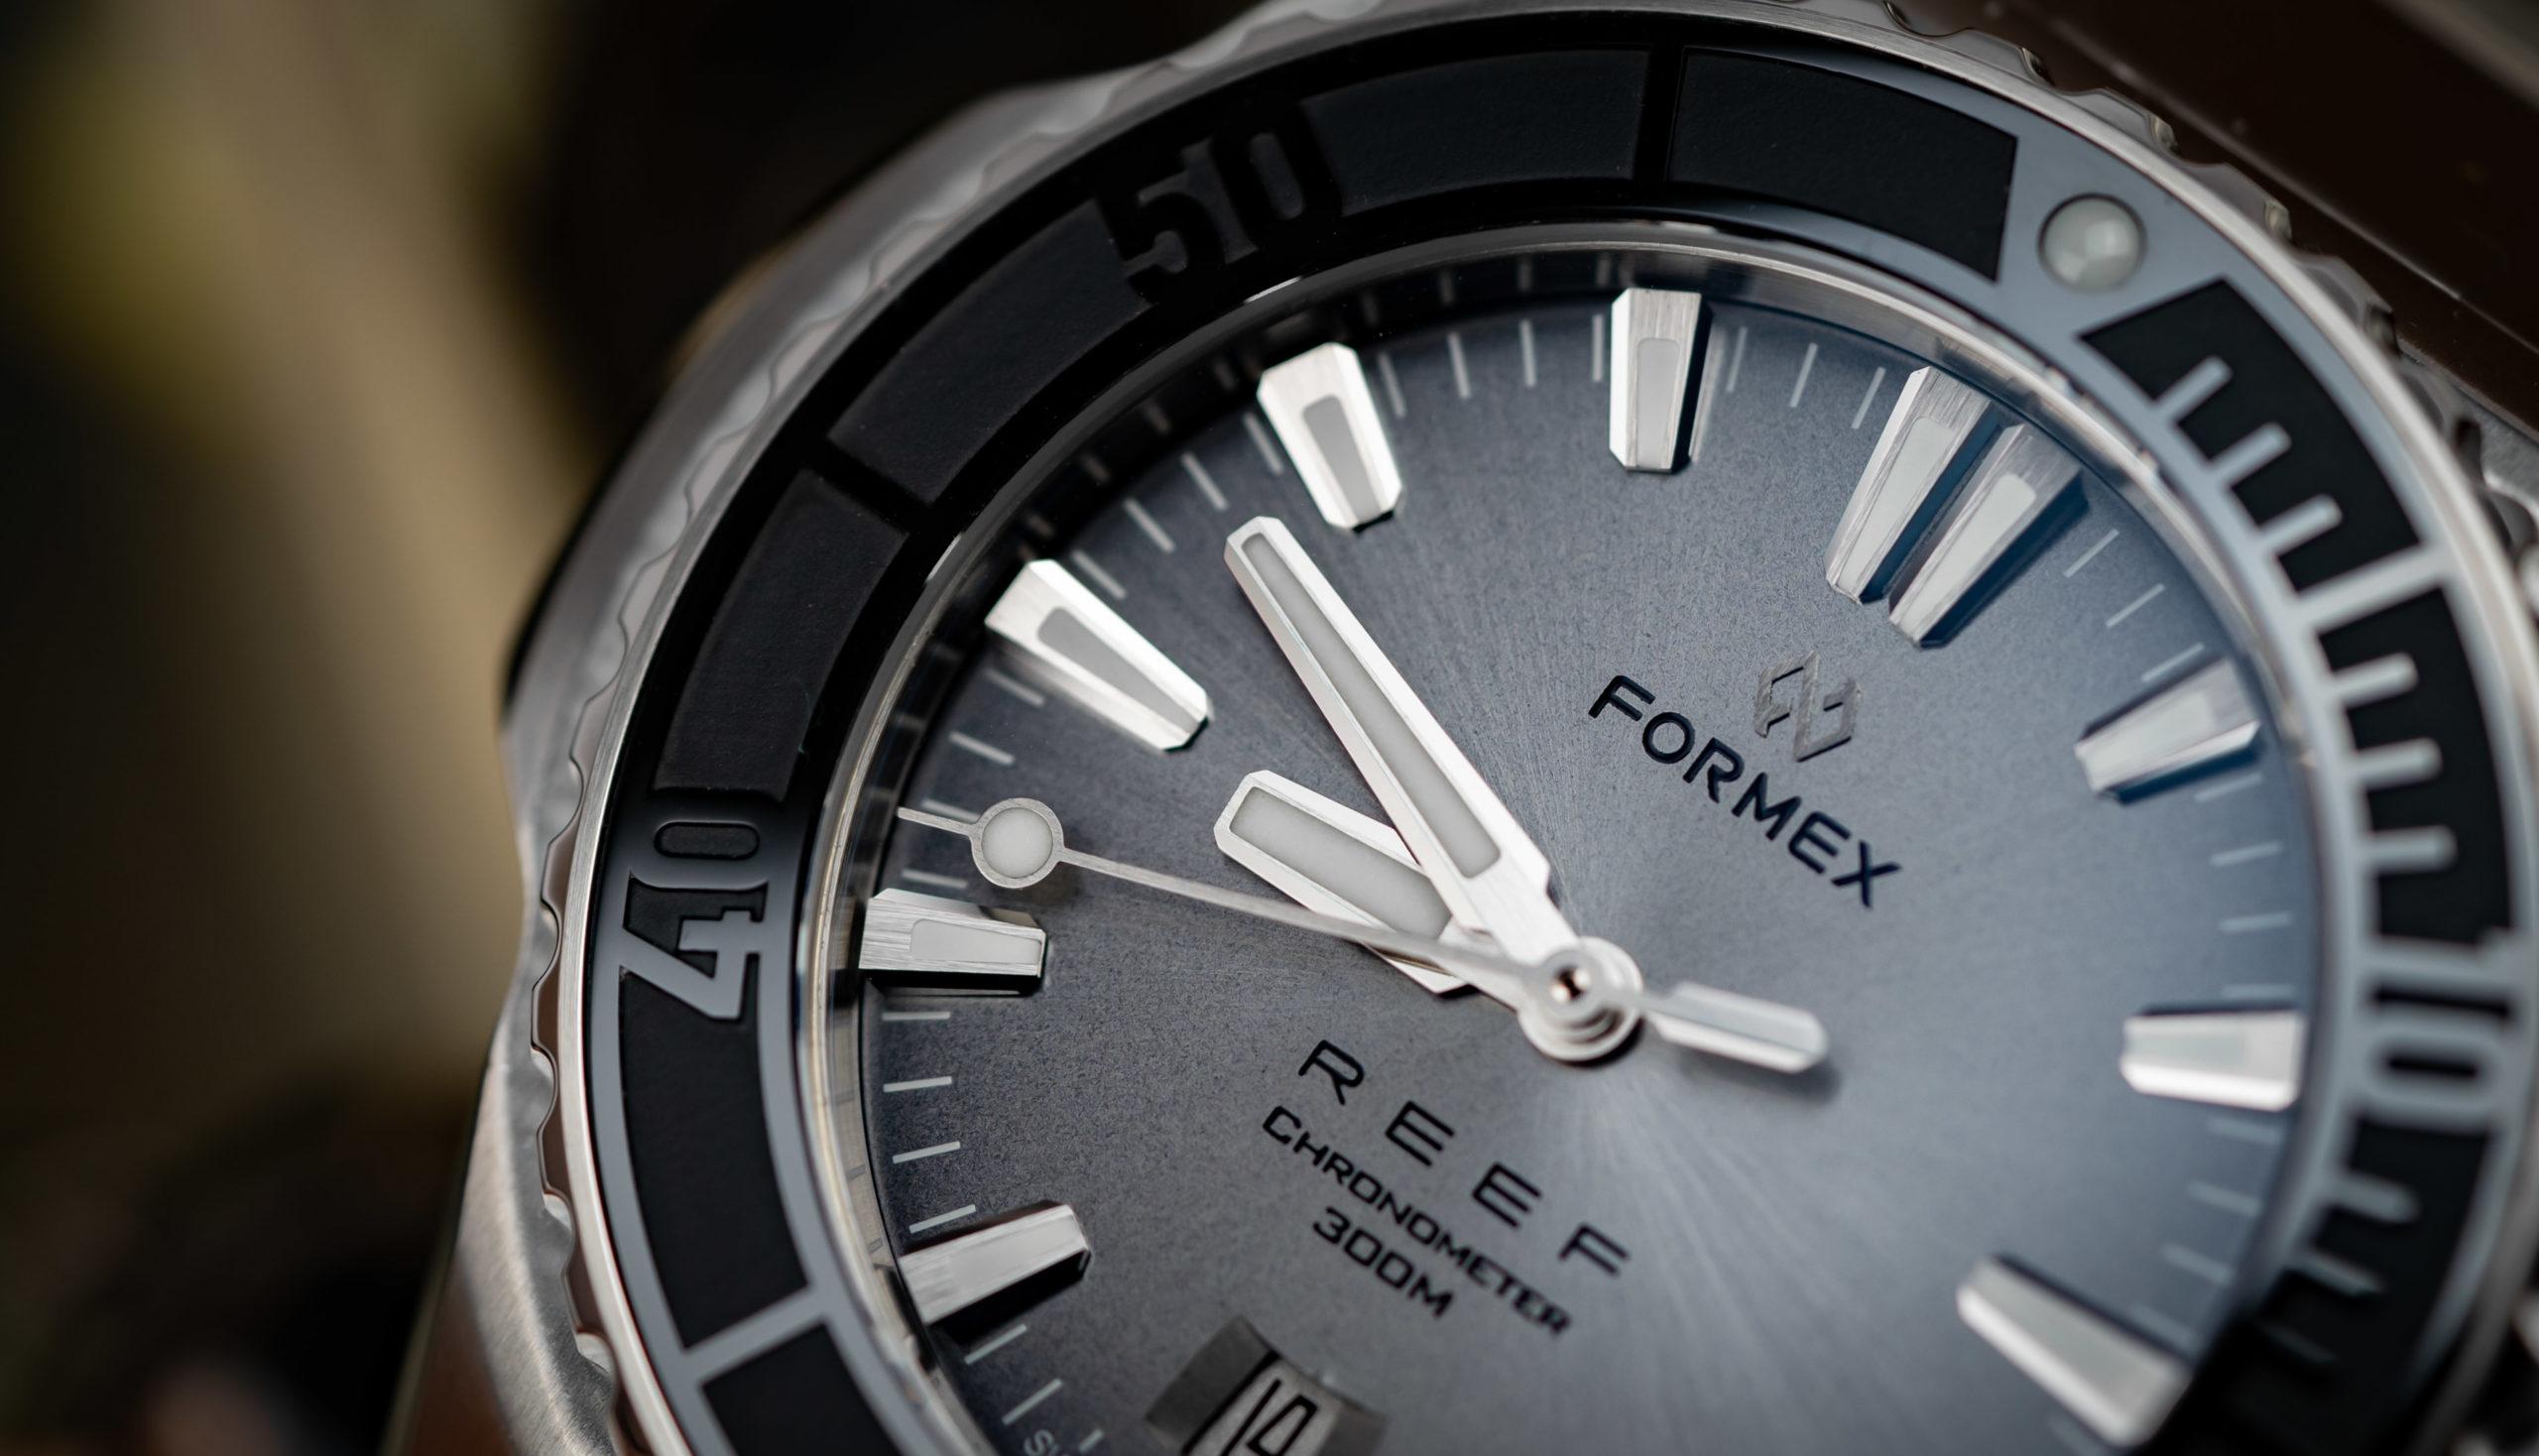 Formex-Reef-Automatik-Chronometer-300m-Test